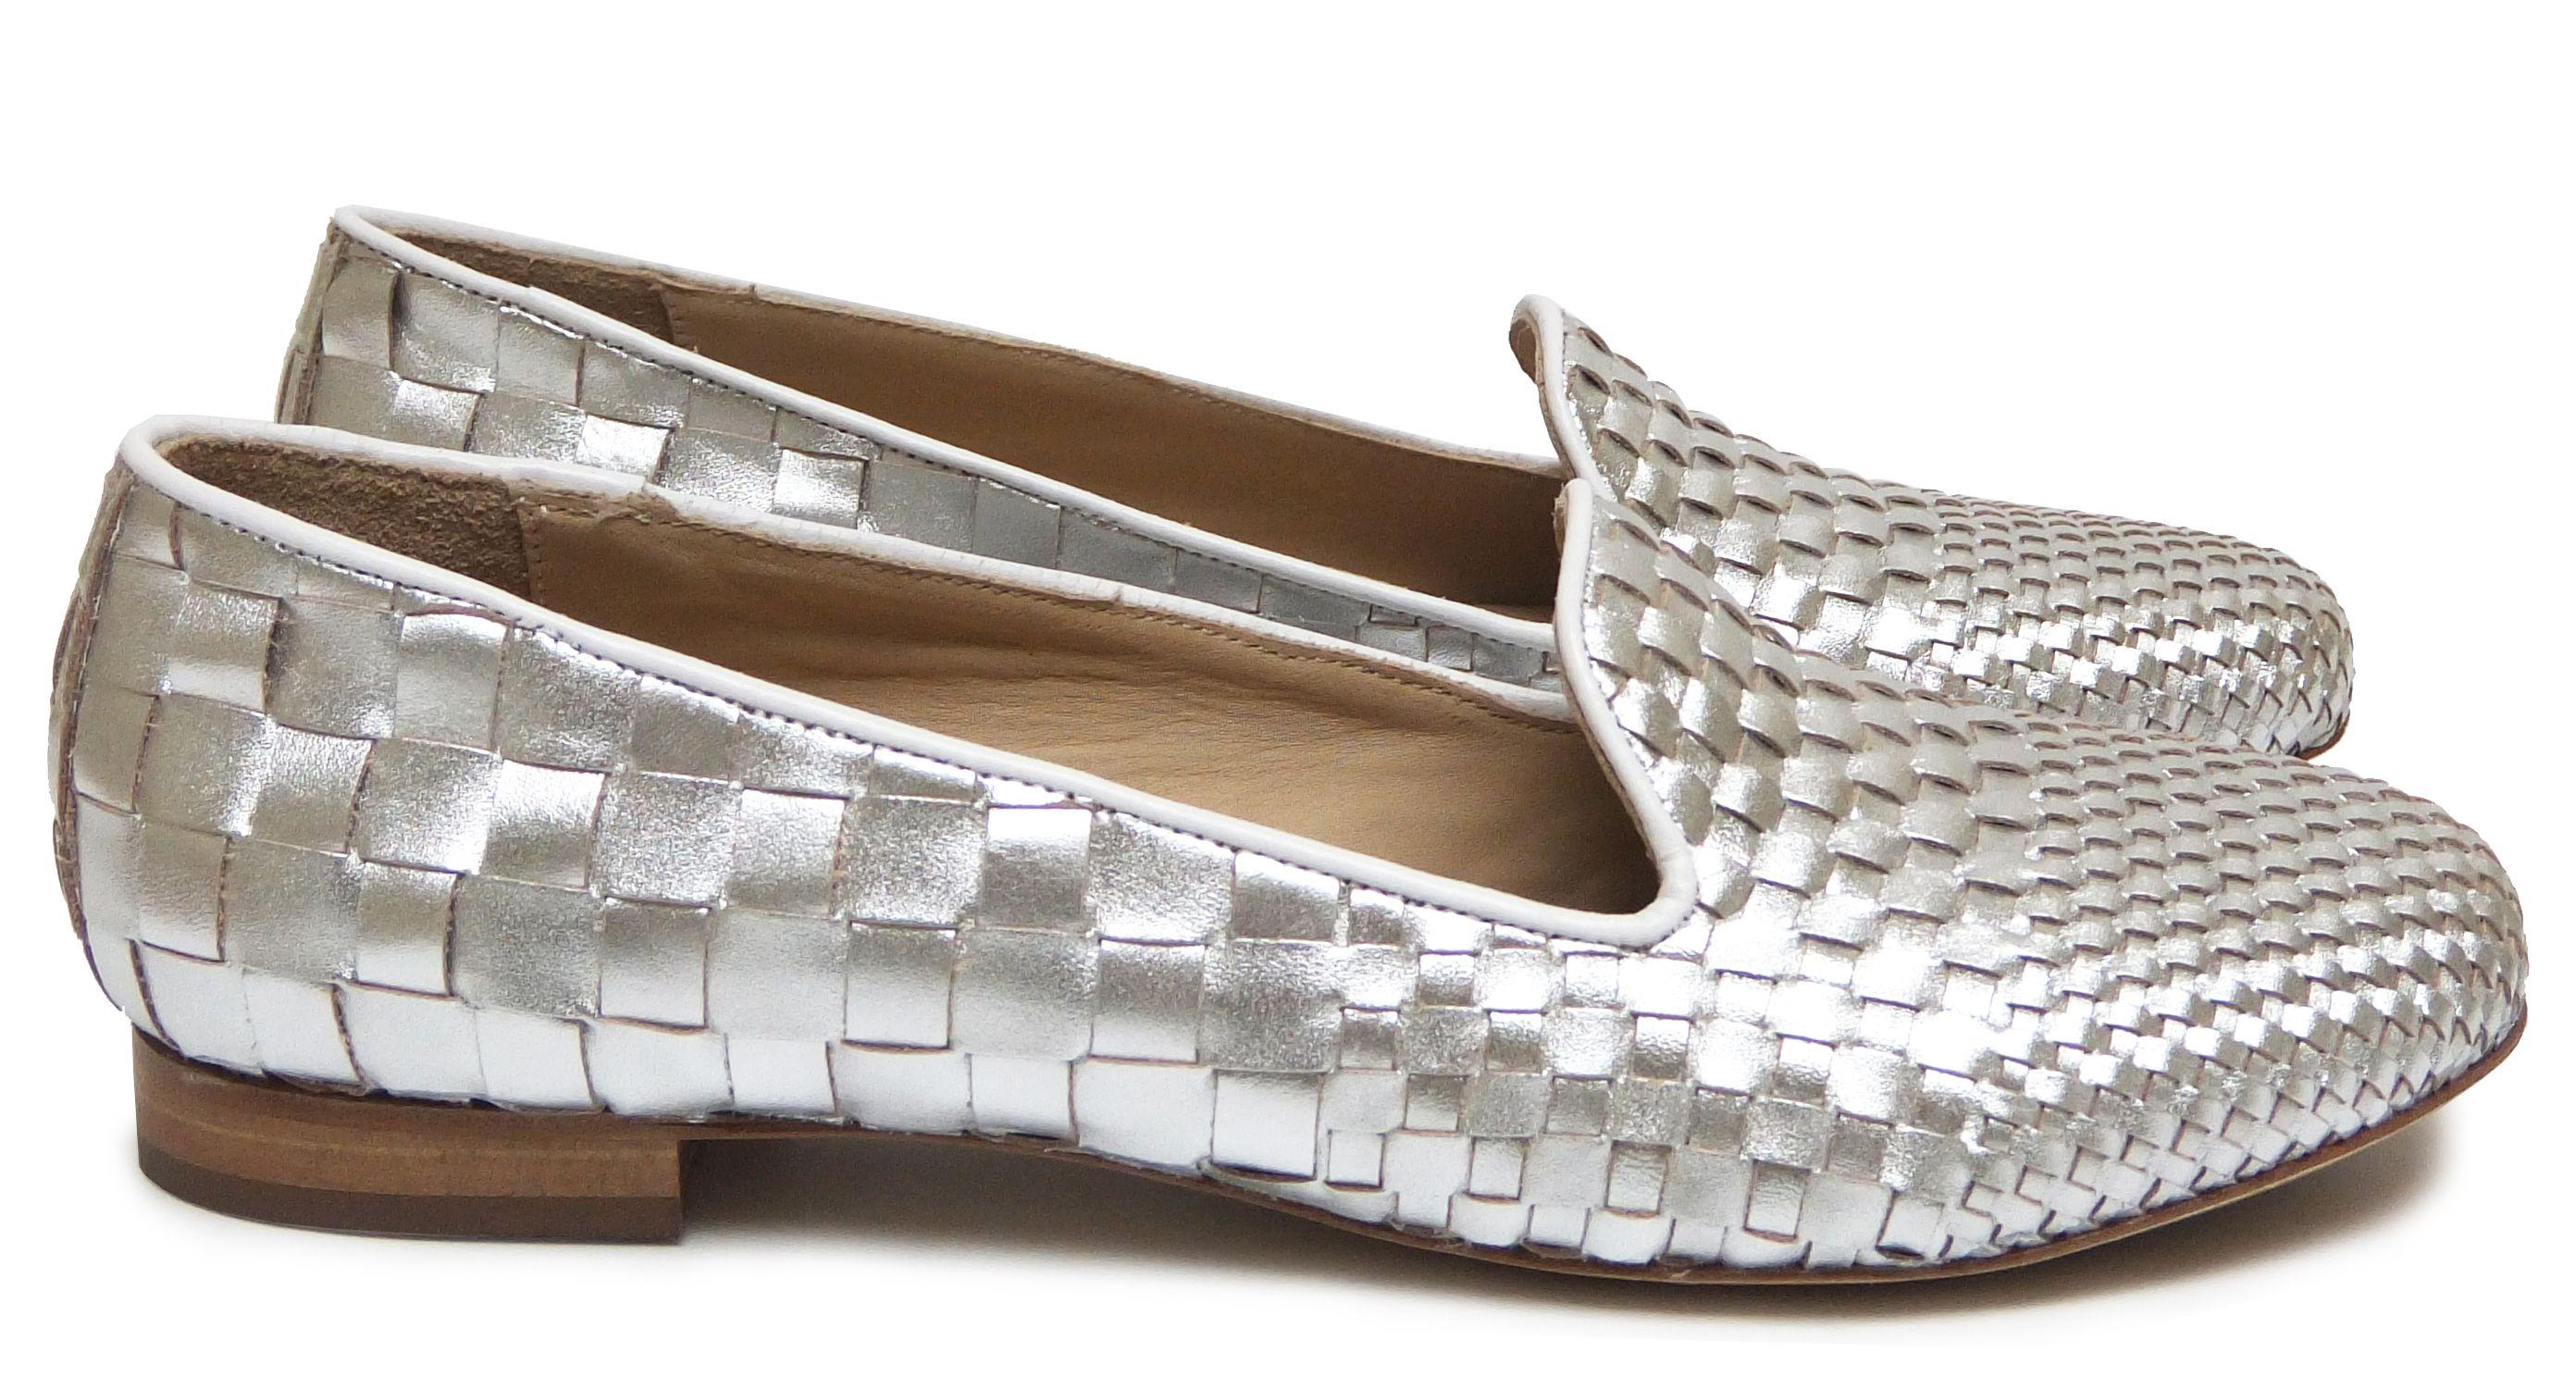 chaussures femme slippers printemps et 2015 maurice manufacture bert cuir tress argent. Black Bedroom Furniture Sets. Home Design Ideas